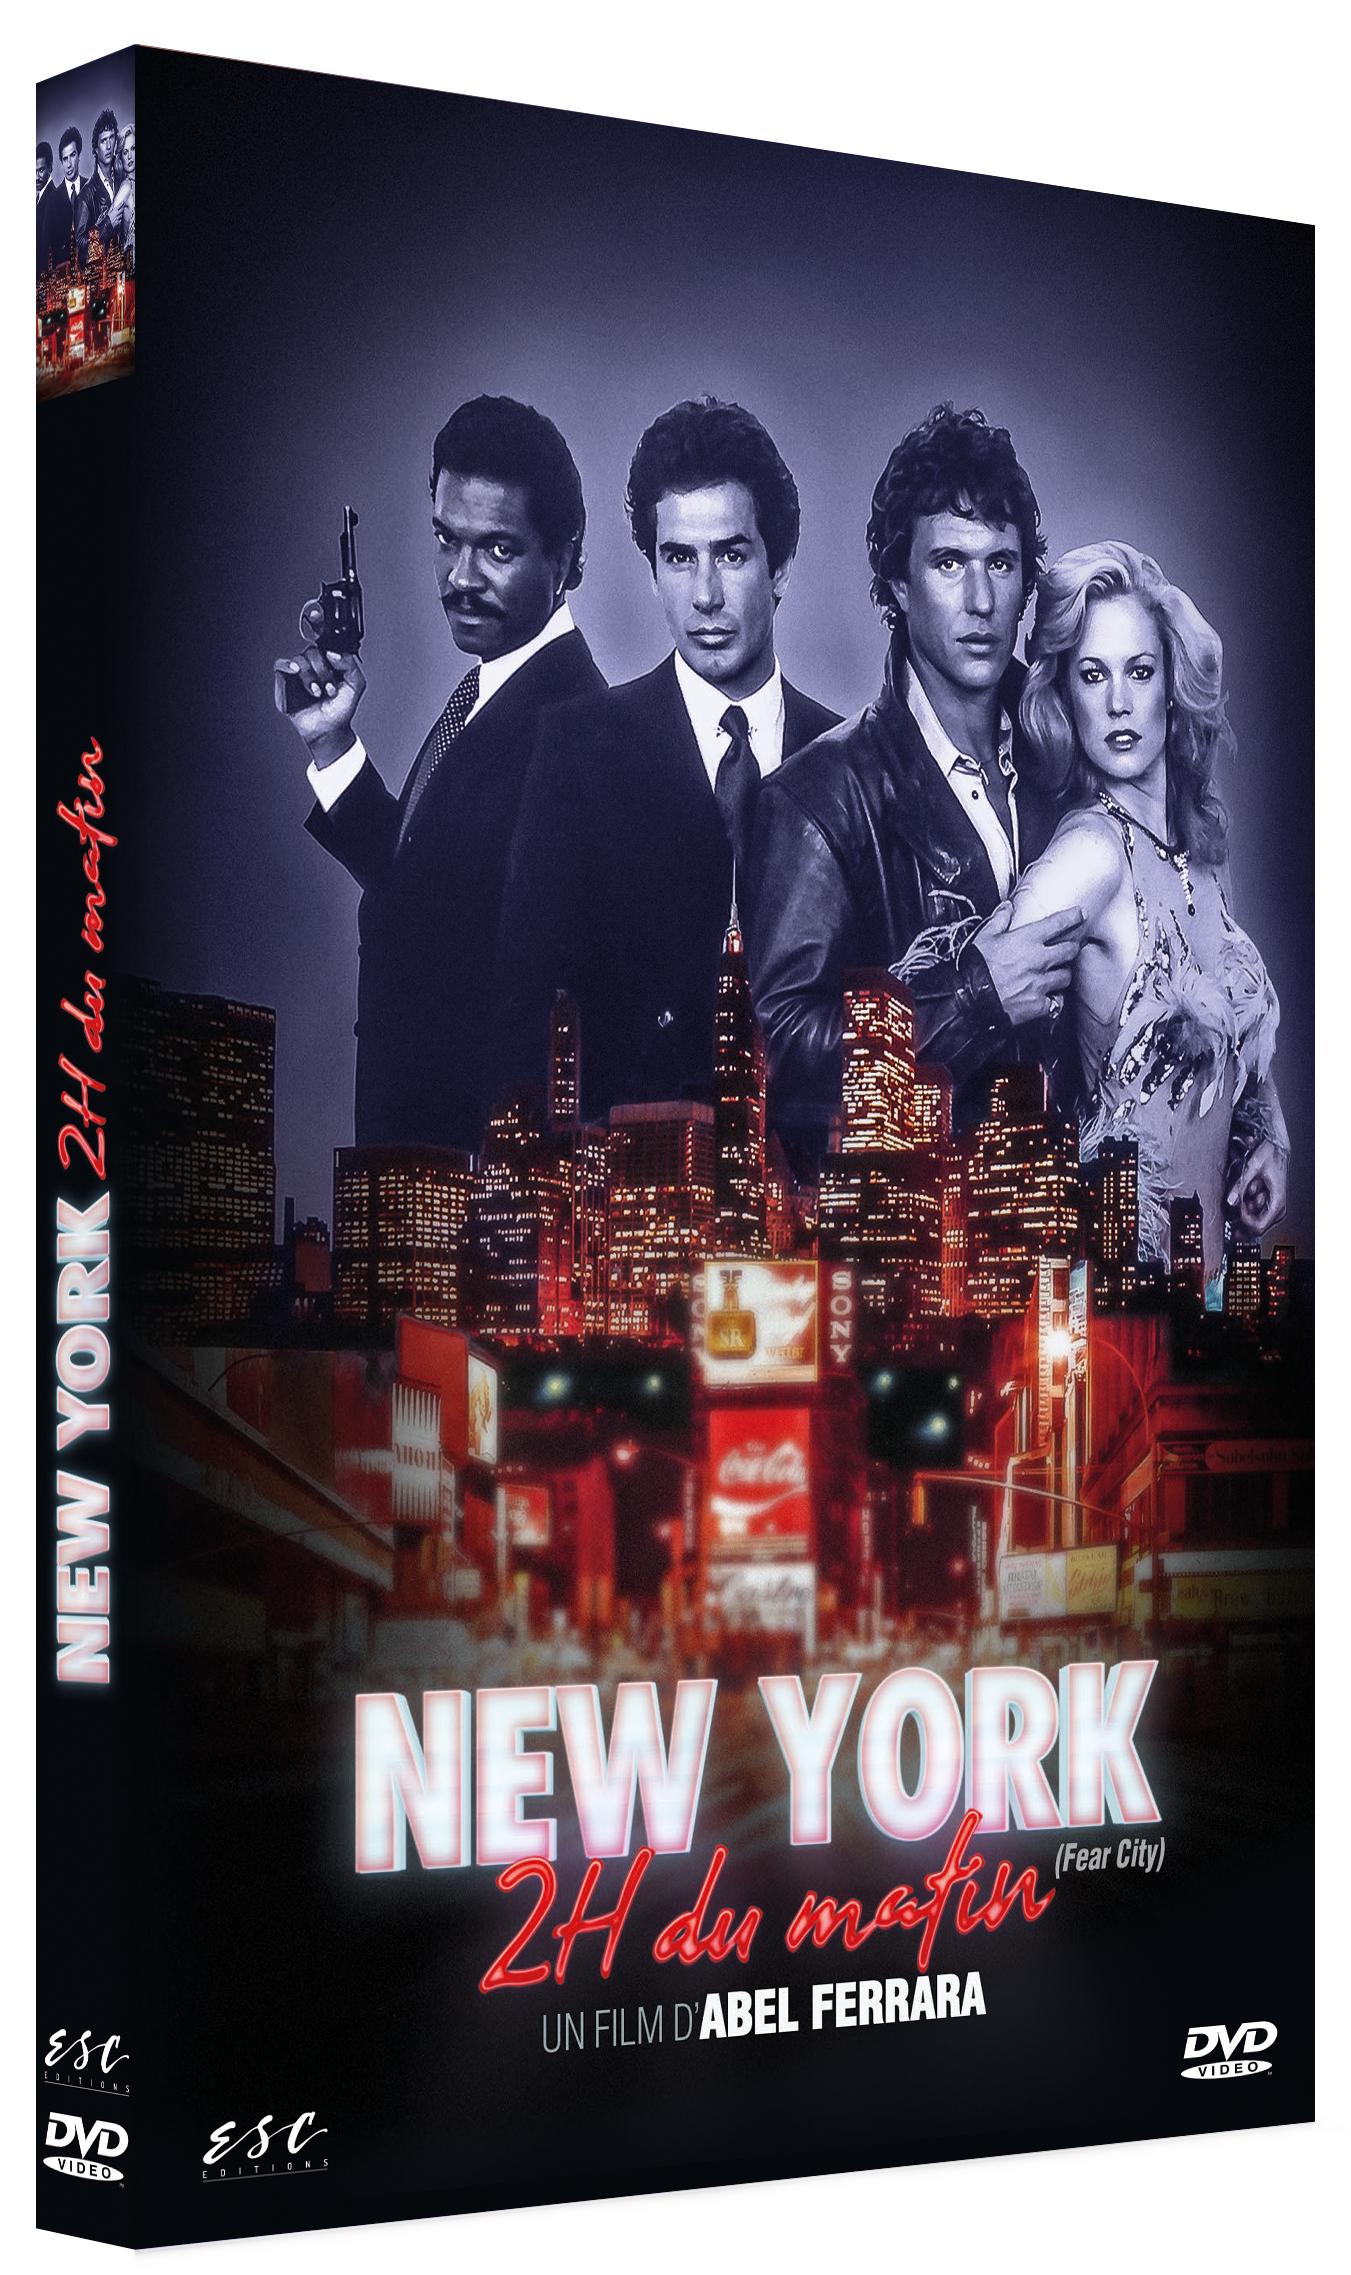 NEW-YORK 2H DU MATIN